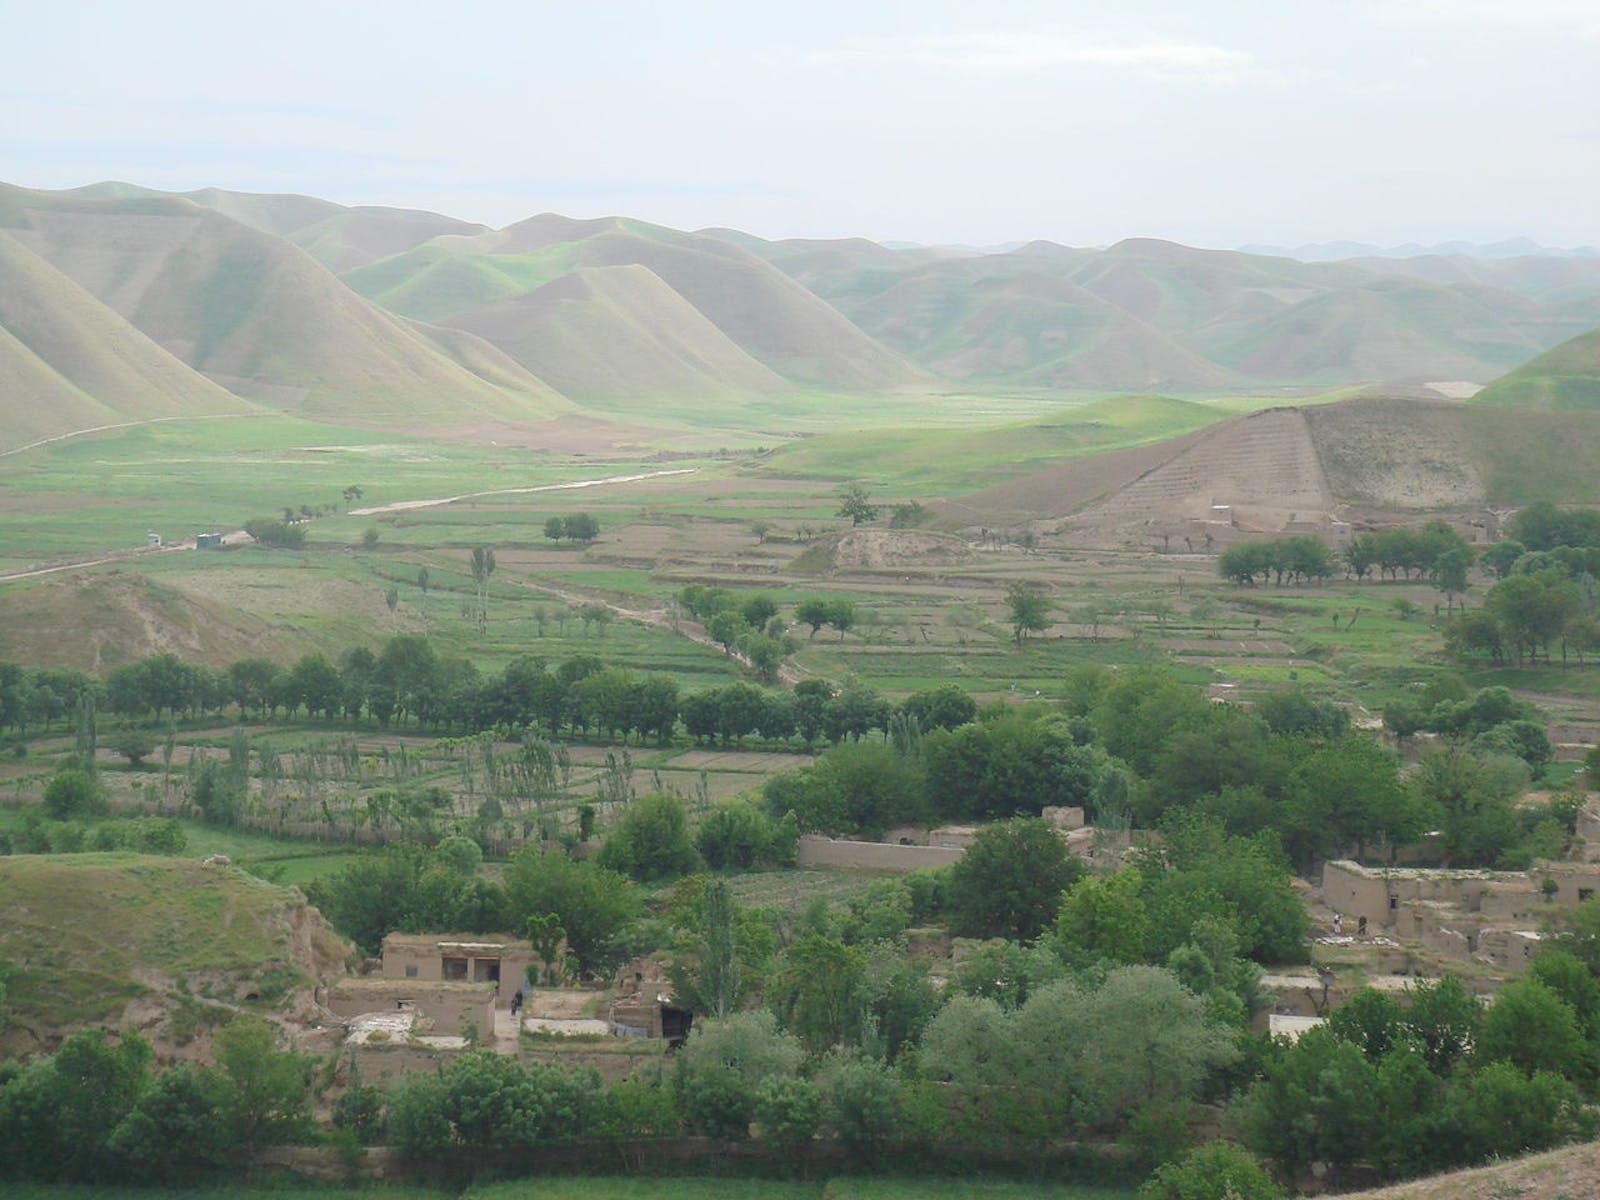 Badghyz and Karabil Semi-Desert